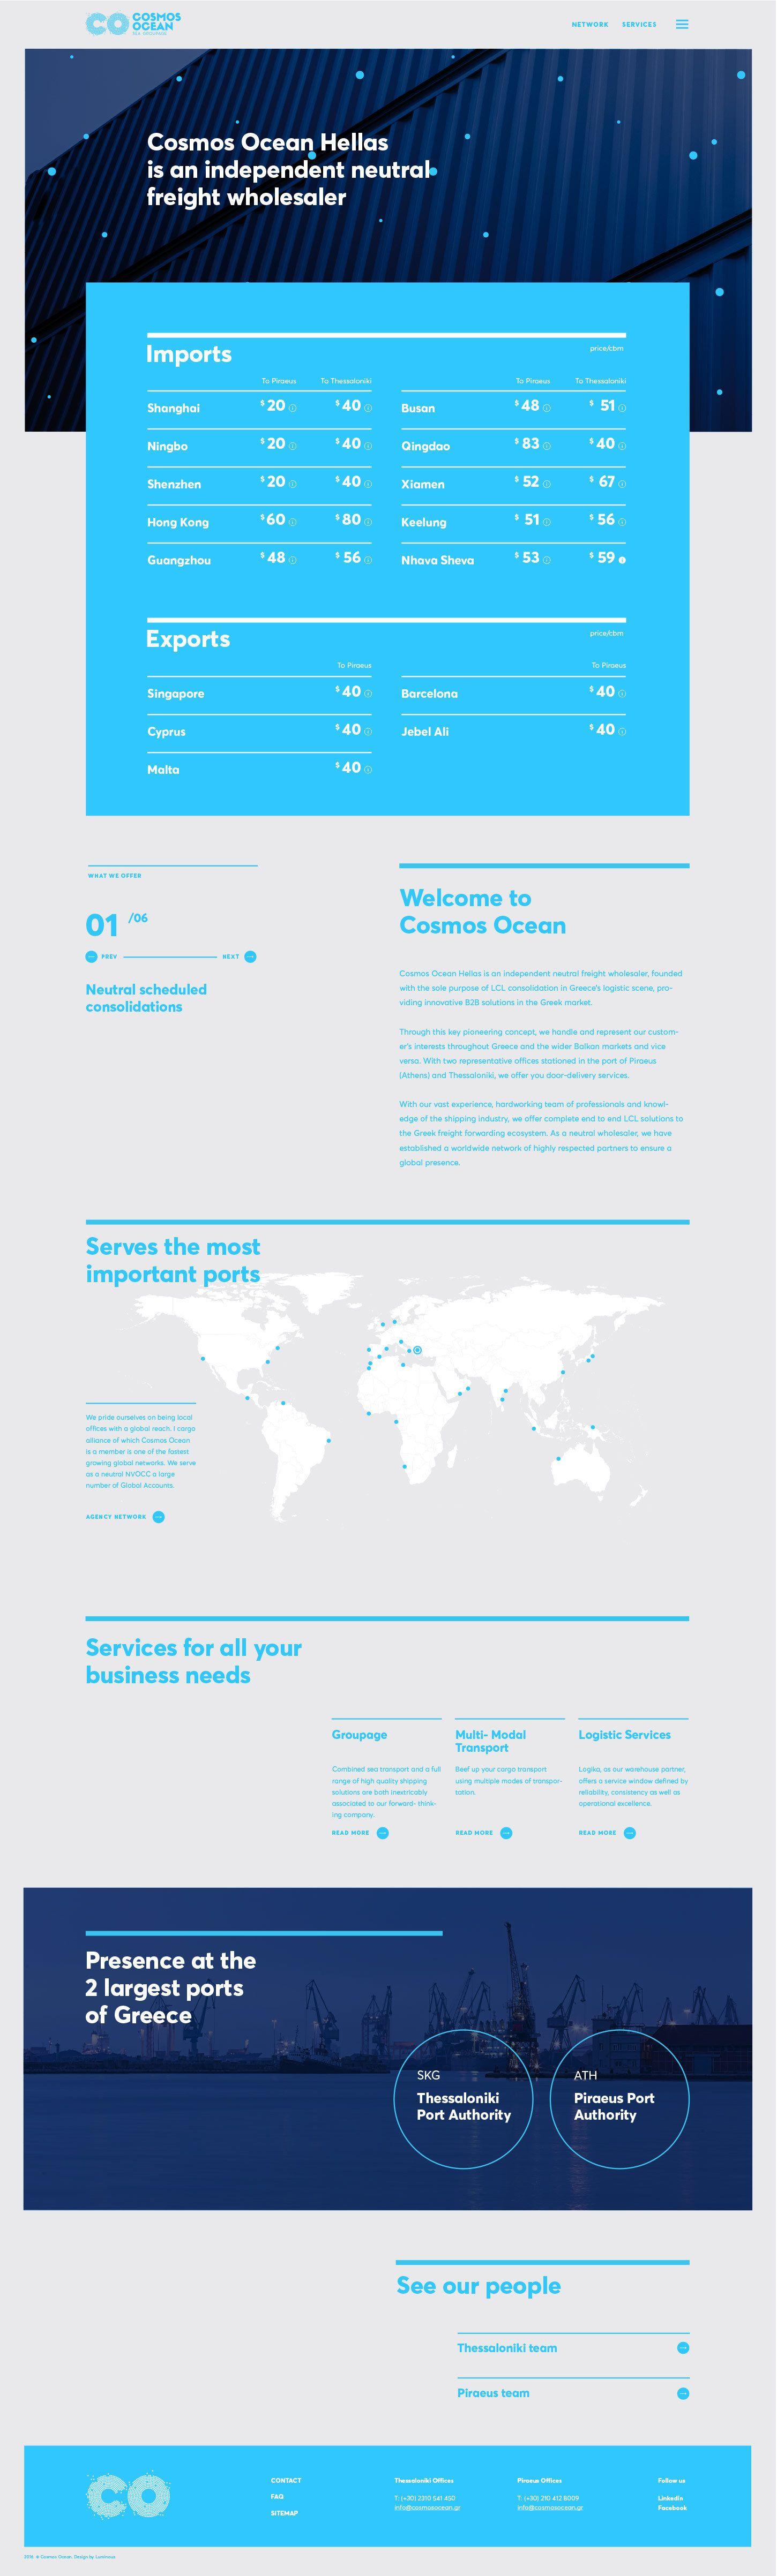 Cosmos Ocean Website Luminous Design Group Cosmos Ocean Web Design